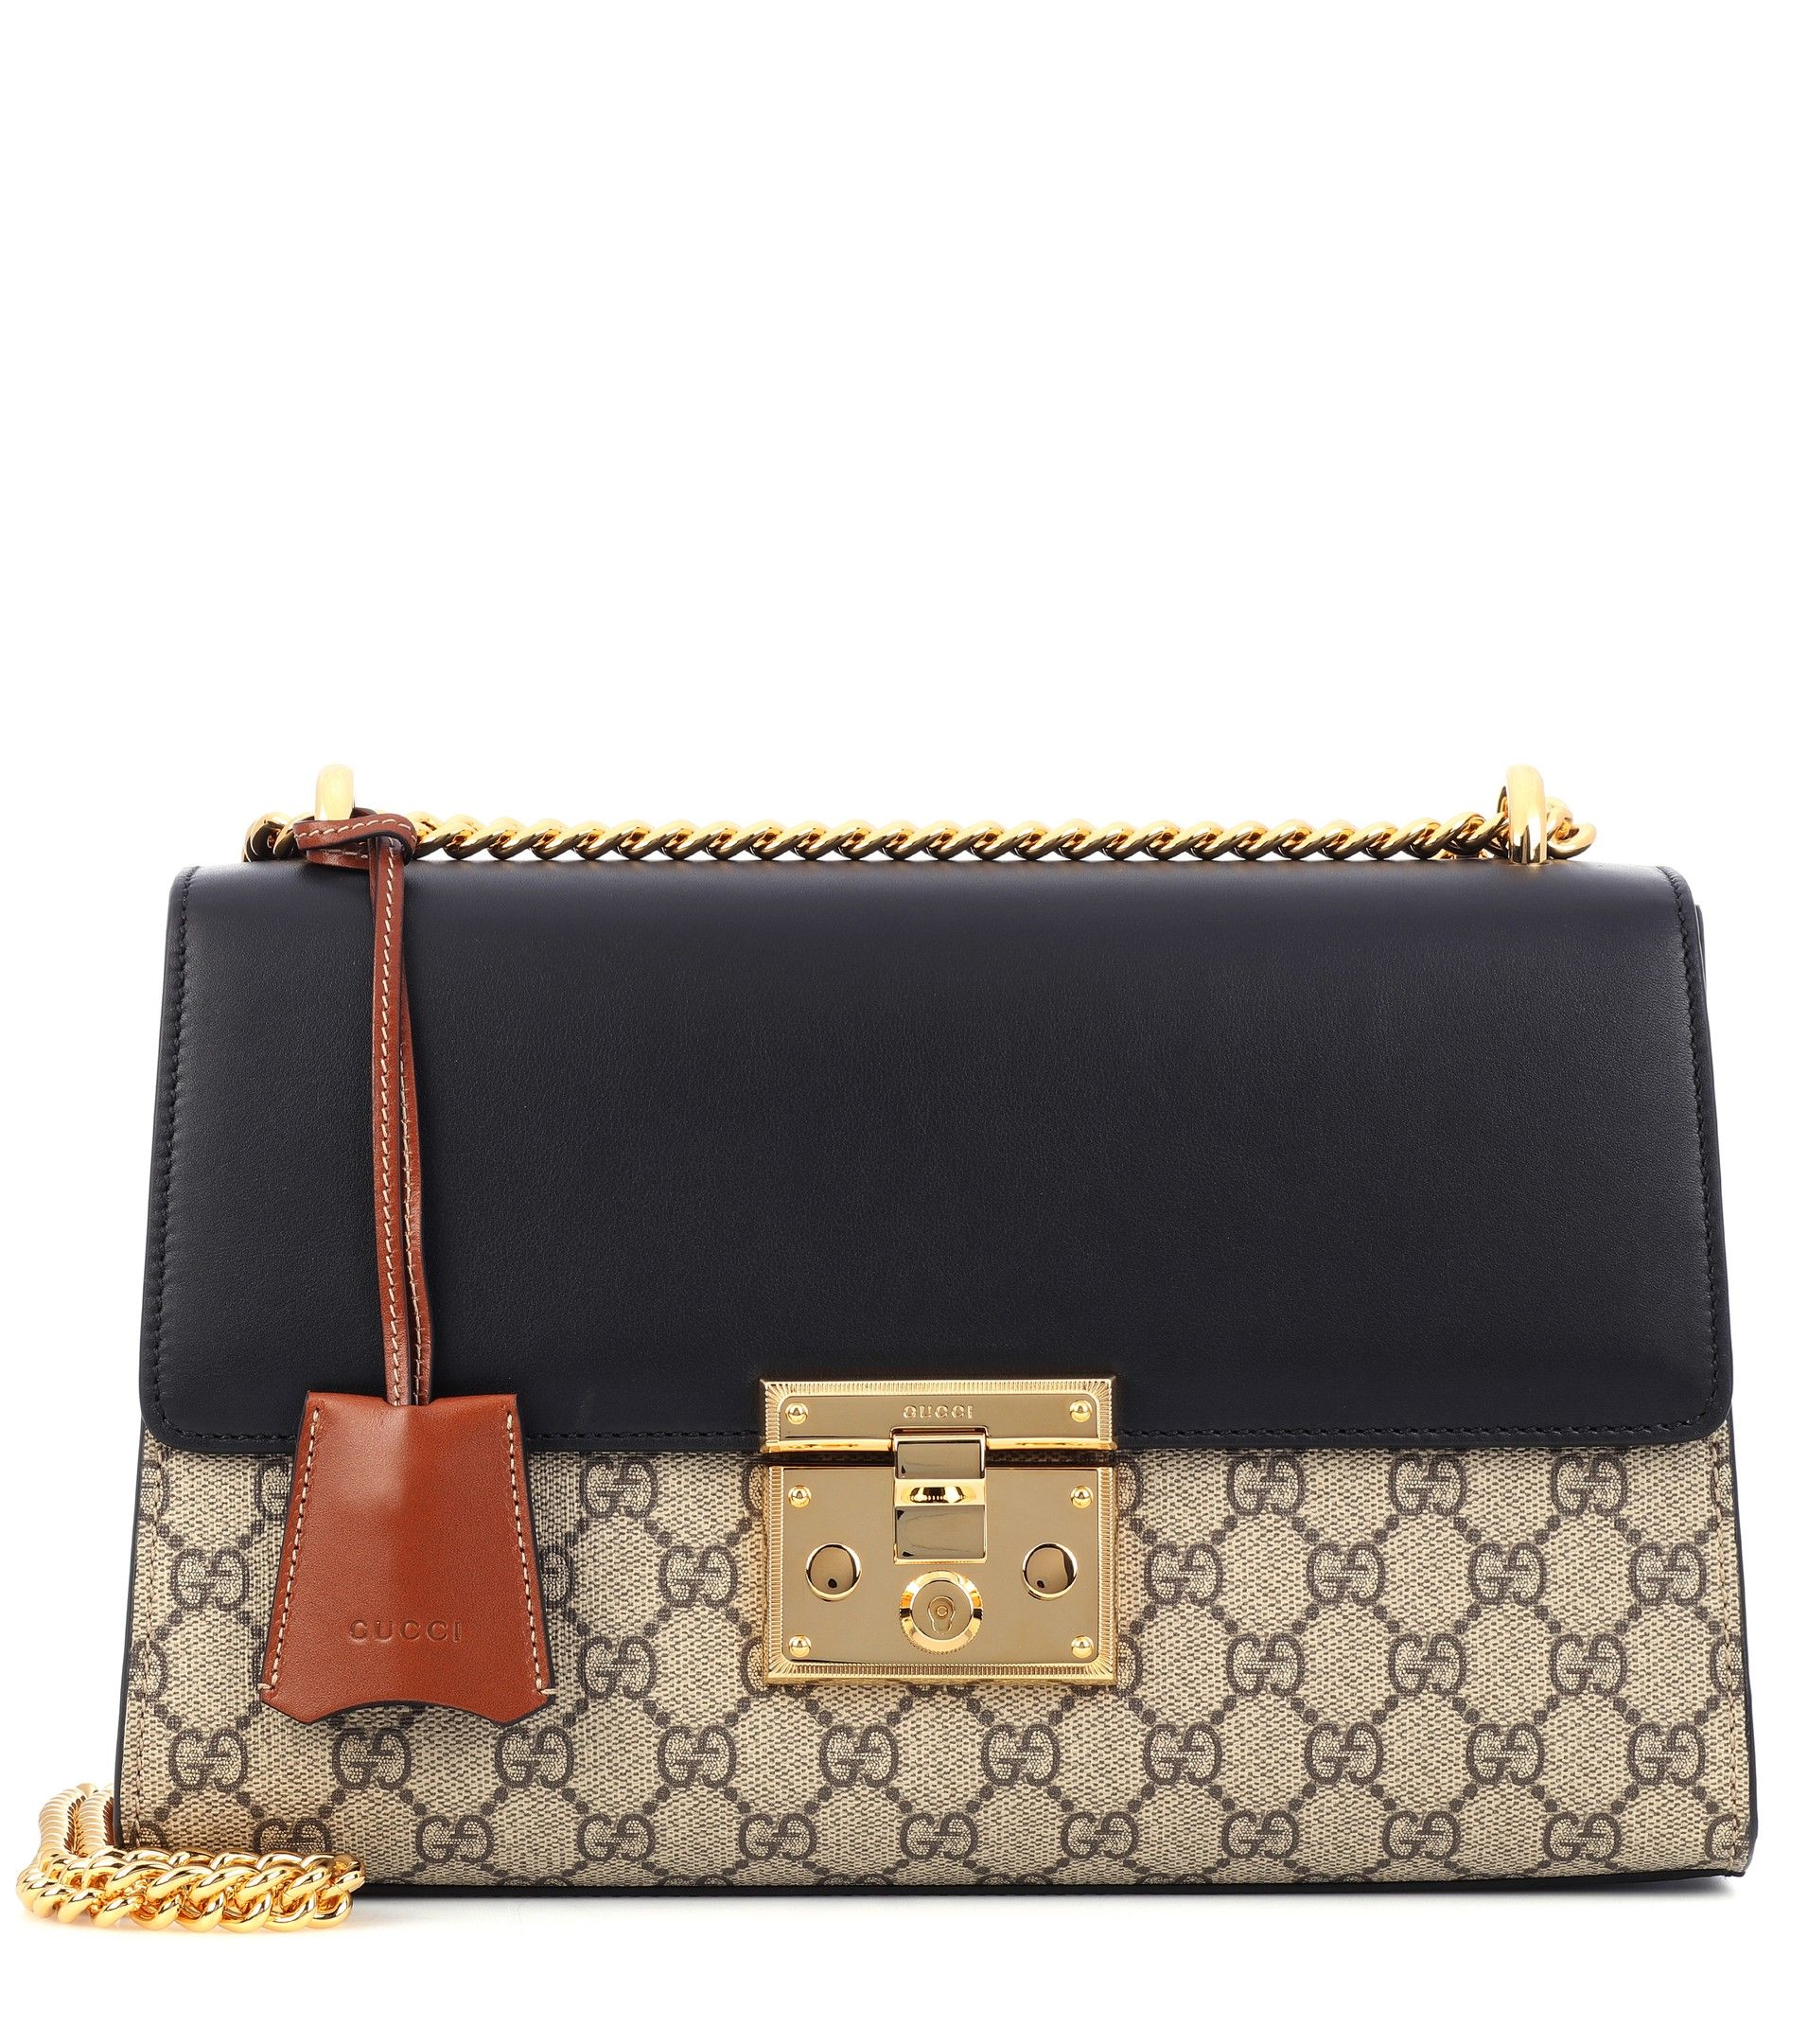 81157fb938cc94 Borsa A Tracolla Padlock Gg Supreme Medium In Pelle   Gucci - mytheresa